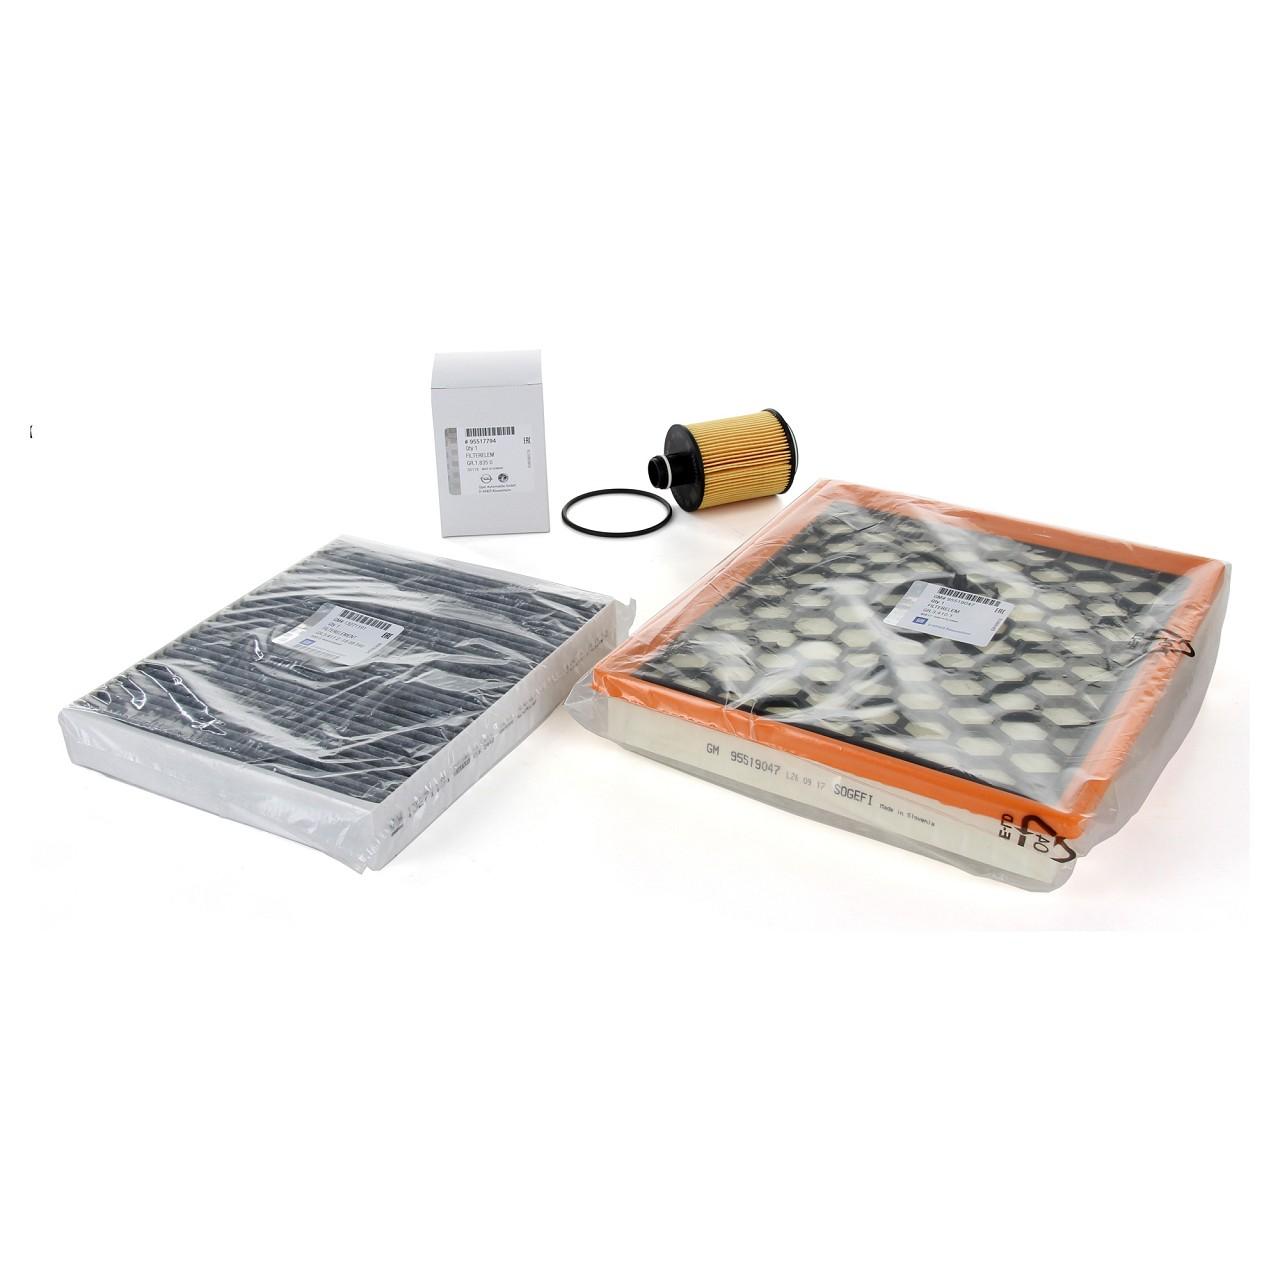 ORIGINAL GM Opel Inspektionskit Filterpaket Filterset INSIGNIA 2.0CDTI 110-160PS